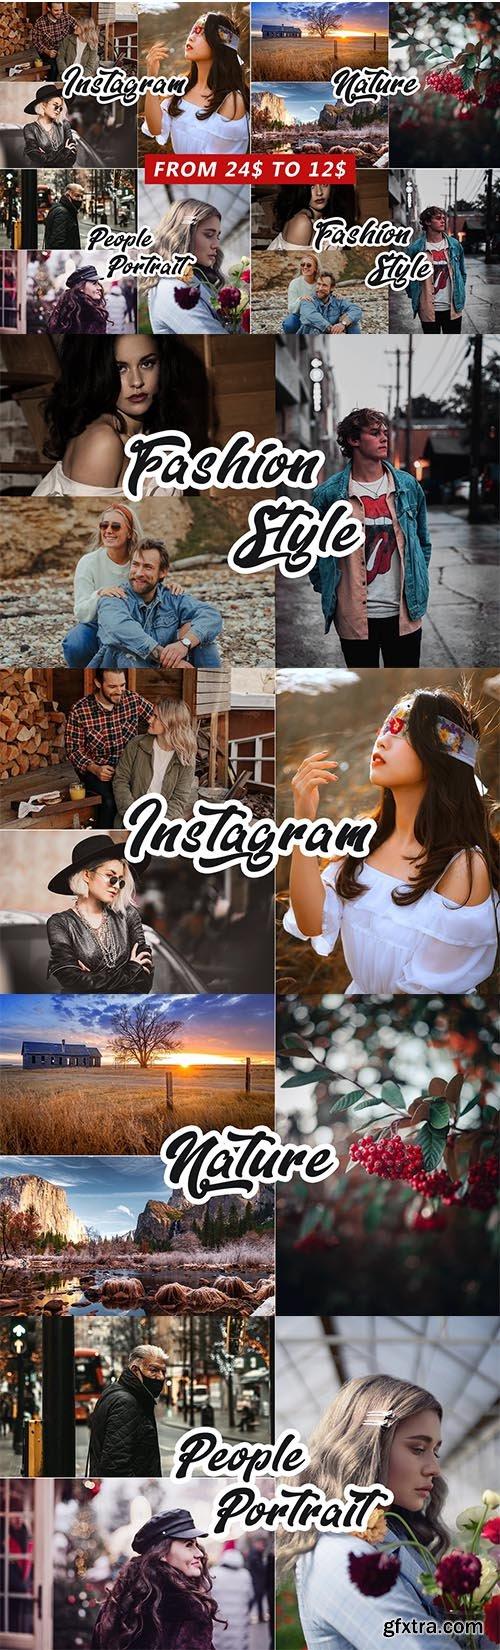 CreativeMarket - 4 IN 1 Photoshop Actions Bundle 5810759